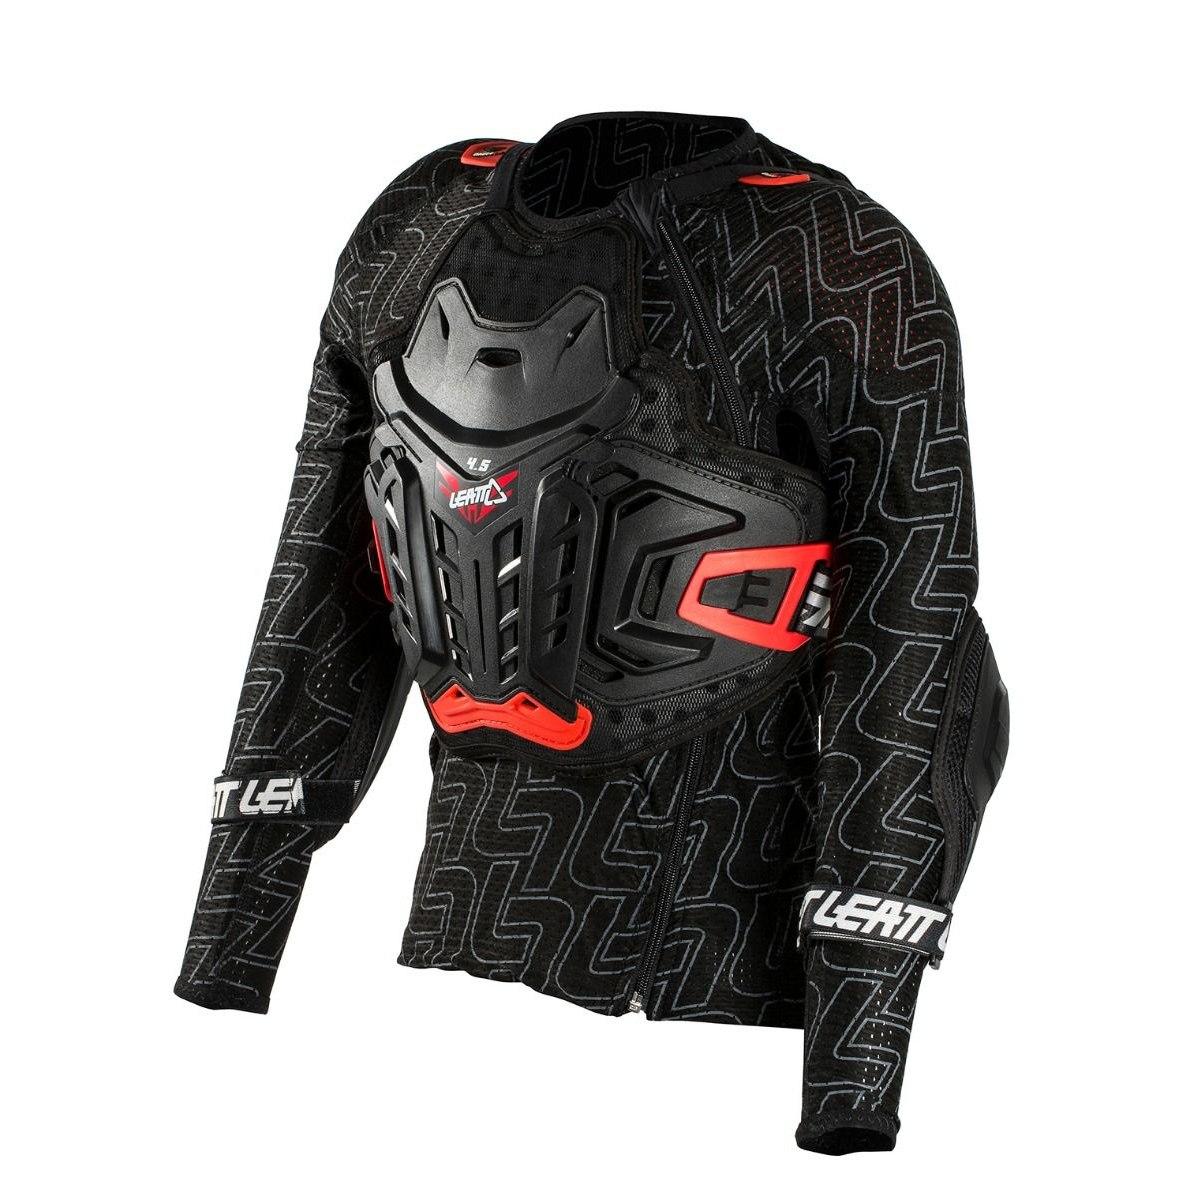 Produktbild von Leatt Body Protector 4.5 Junior - black